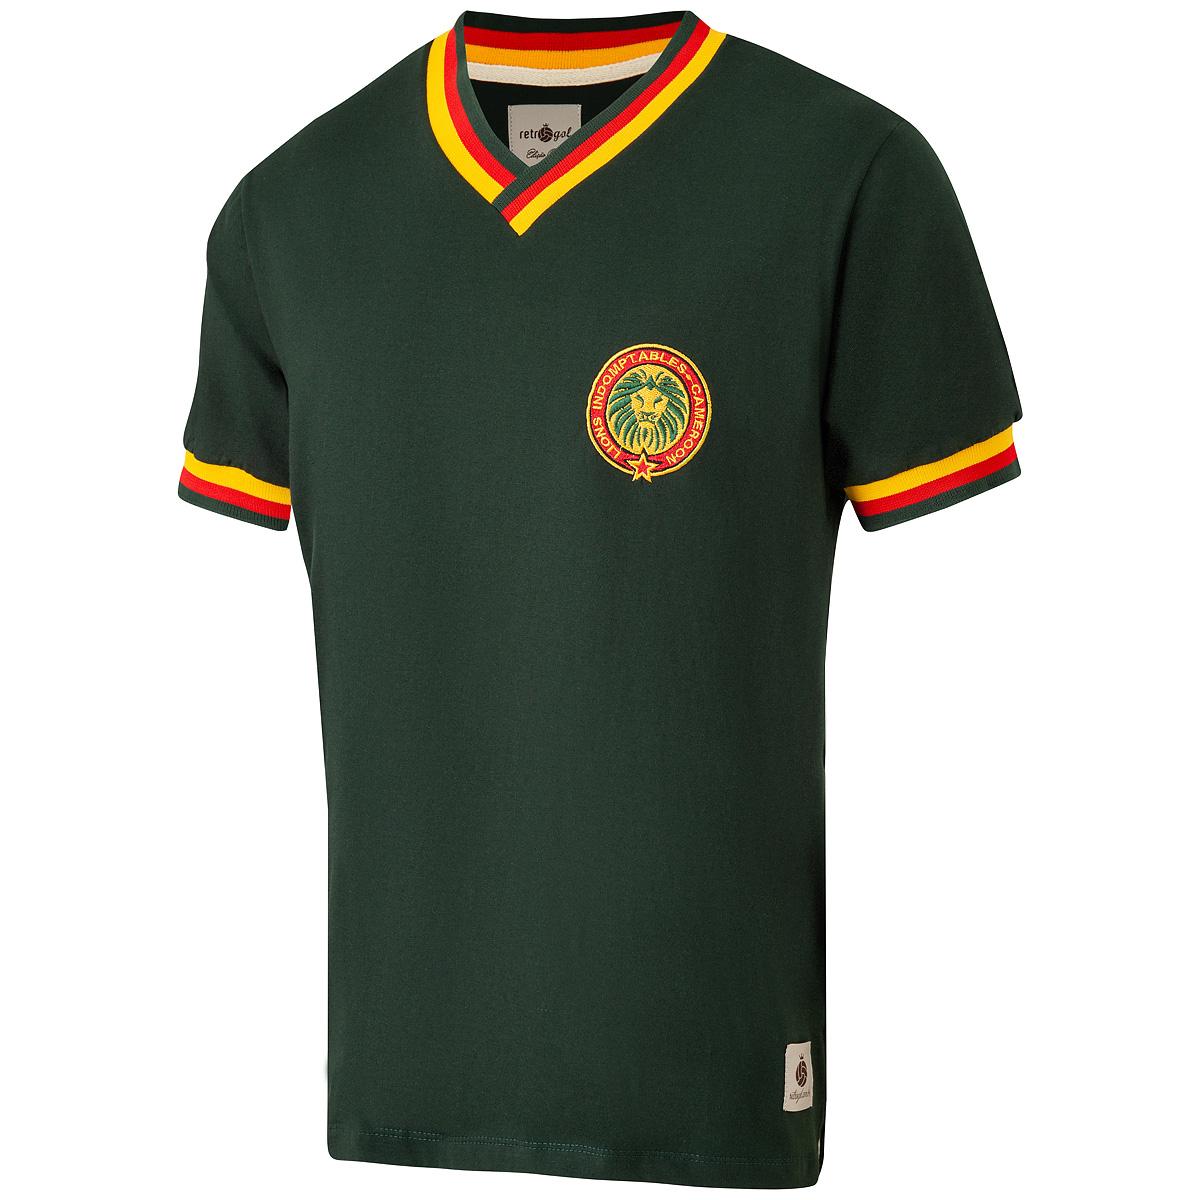 Camisa Camarões Retrô Masculina